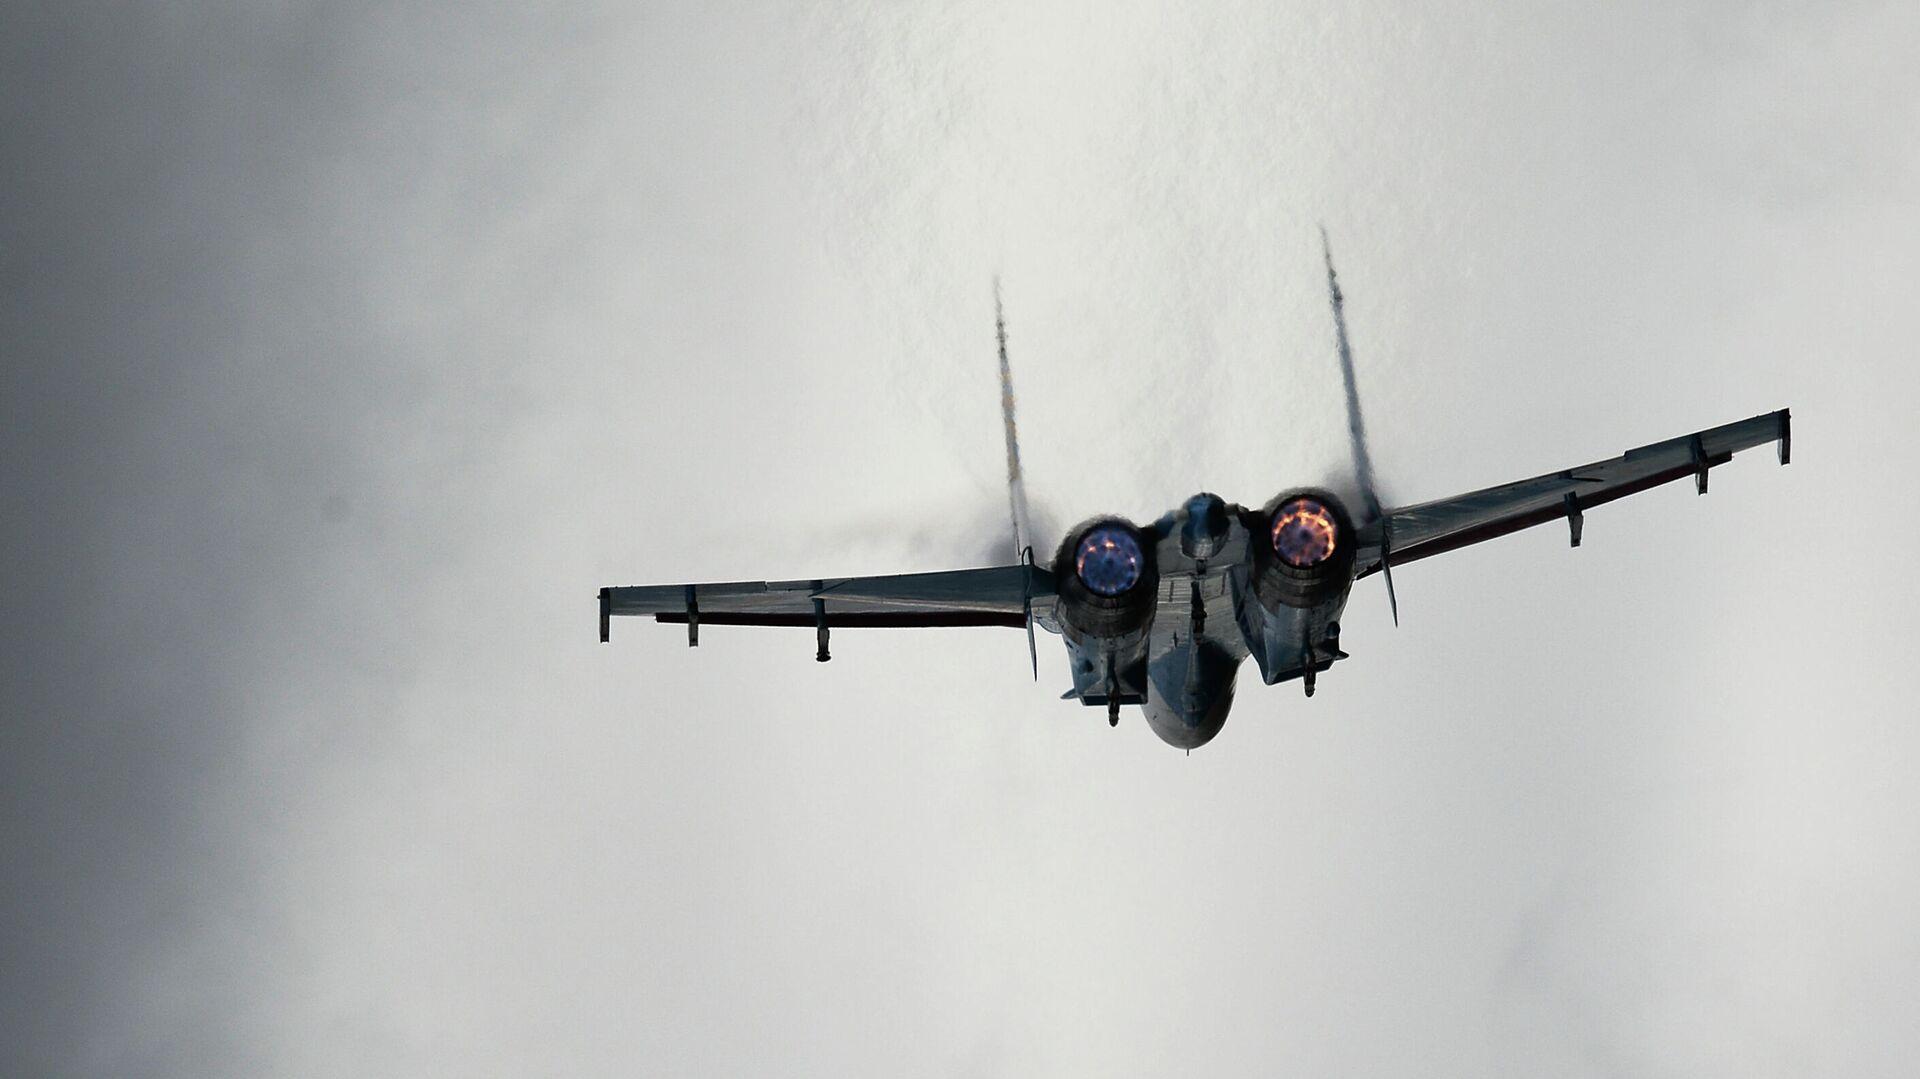 Самолет Су-27 - РИА Новости, 1920, 08.09.2020